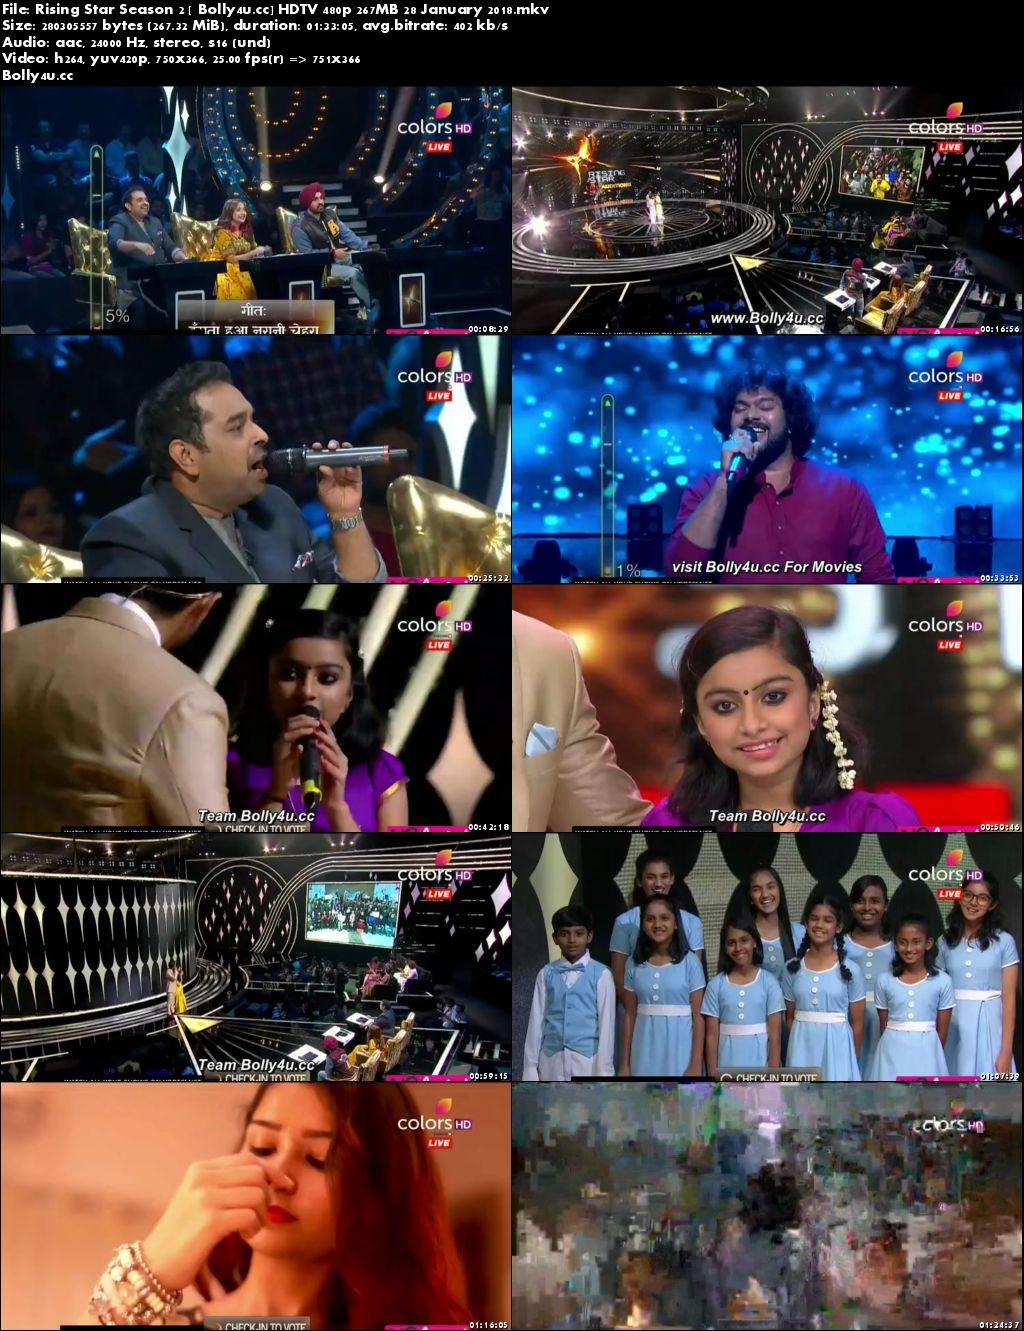 Rising Star Season 2 HDTV 480p 250MB 28 January 2018 Download